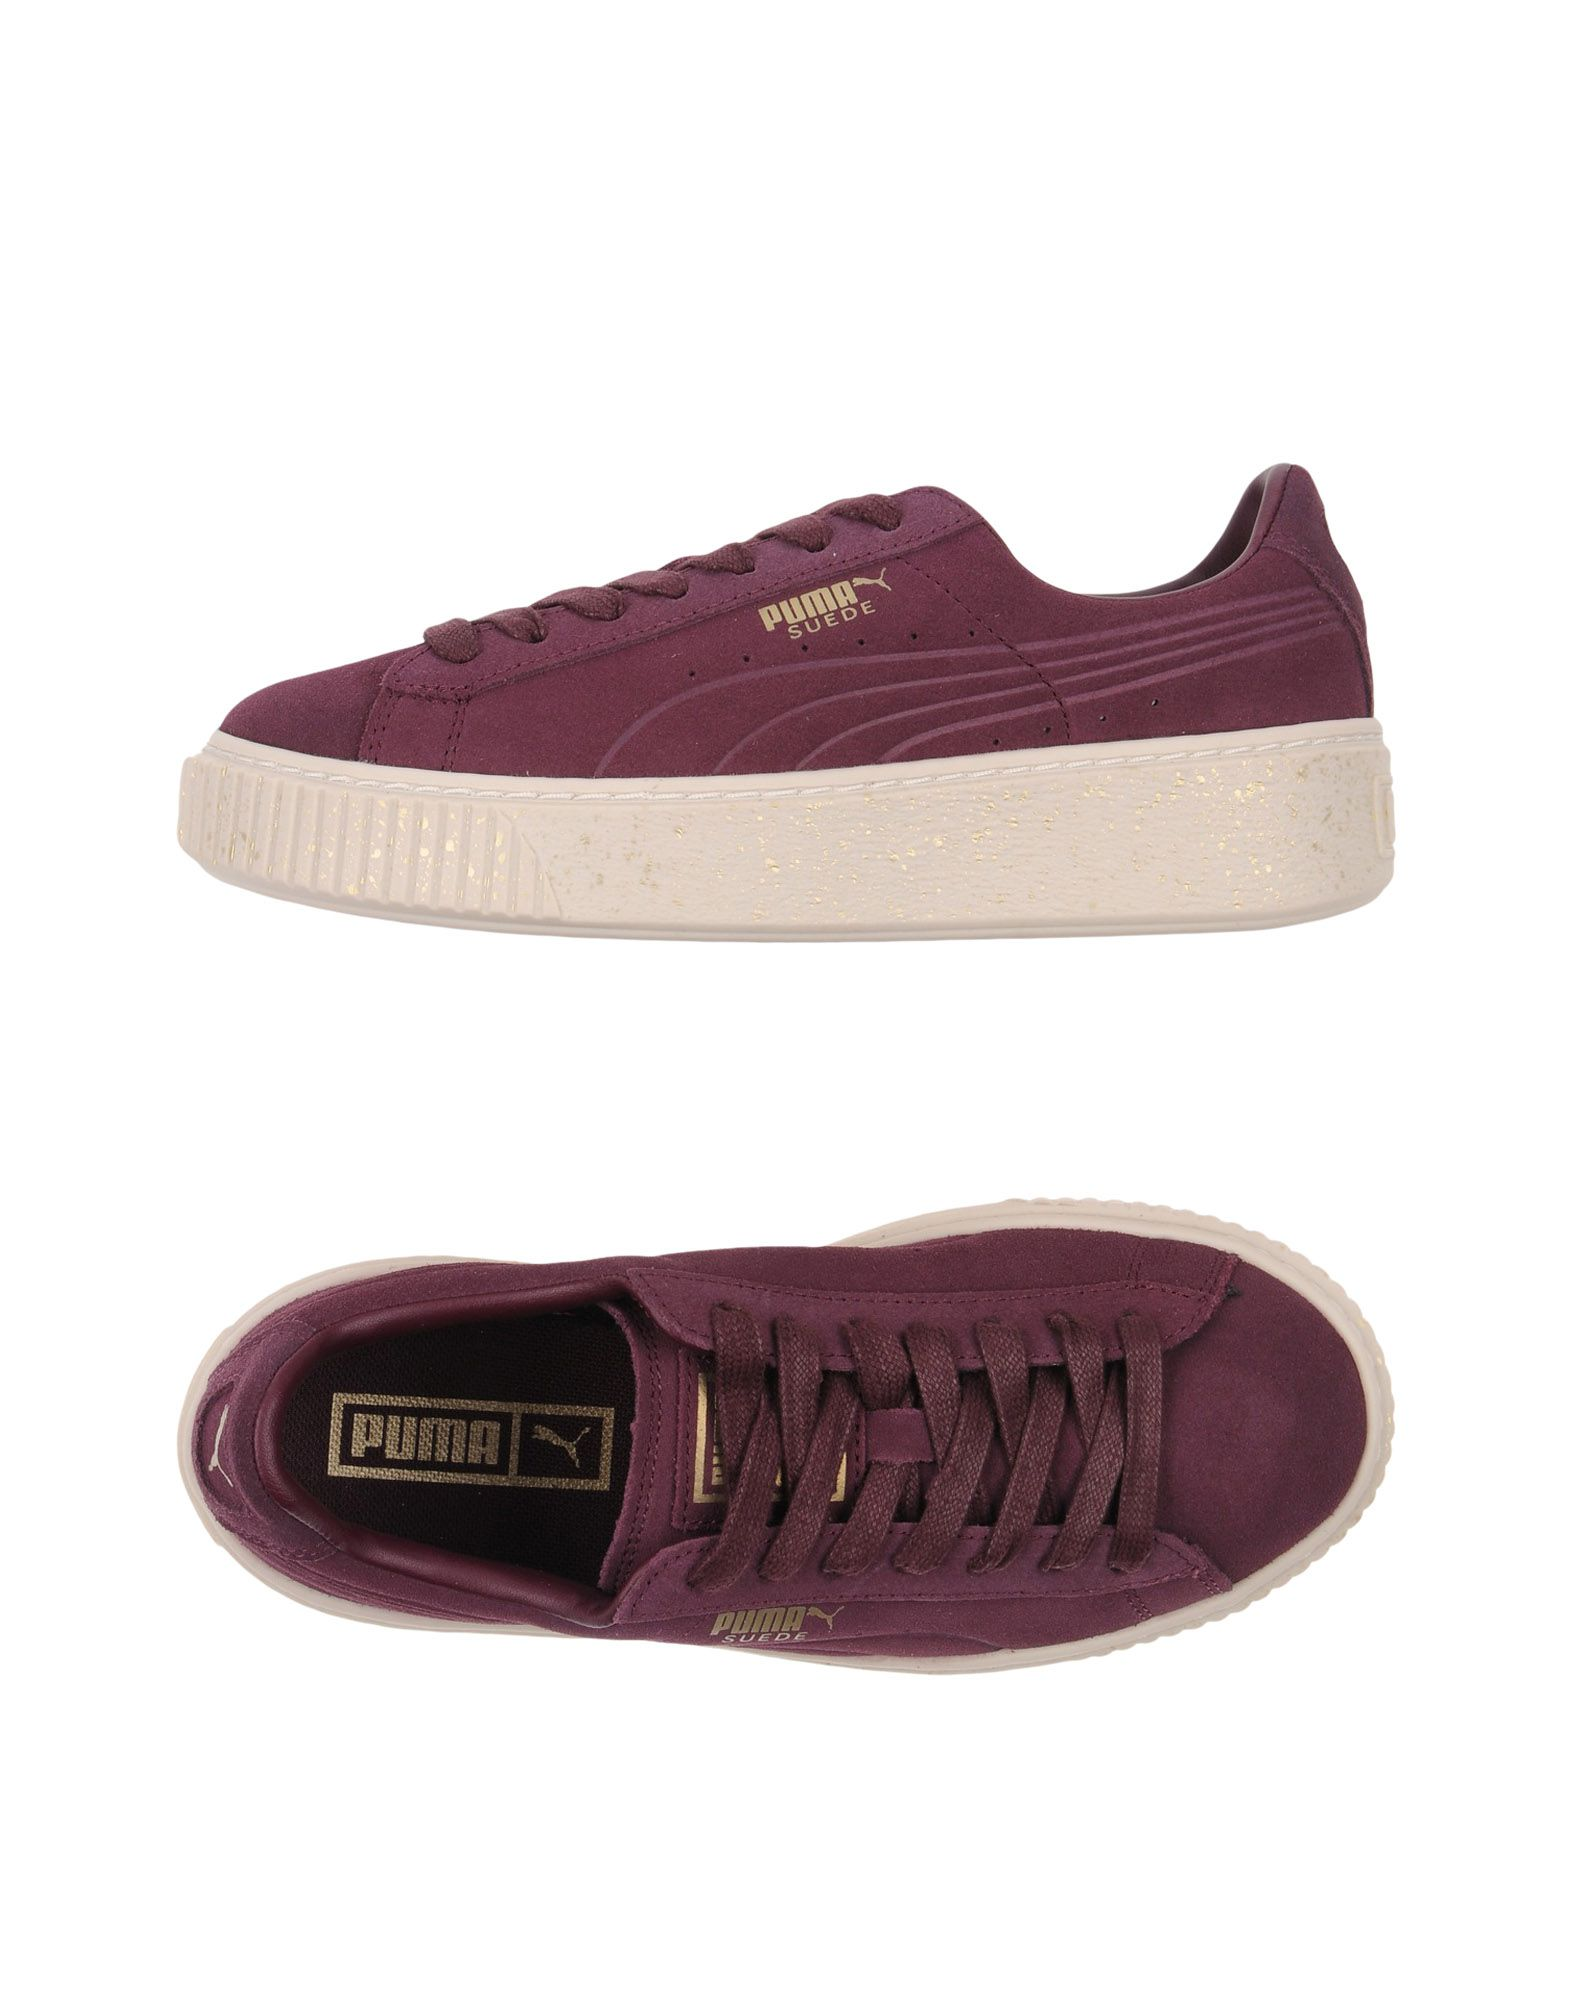 Puma Sneakers beliebte Damen  11264113LO Gute Qualität beliebte Sneakers Schuhe 920ec2